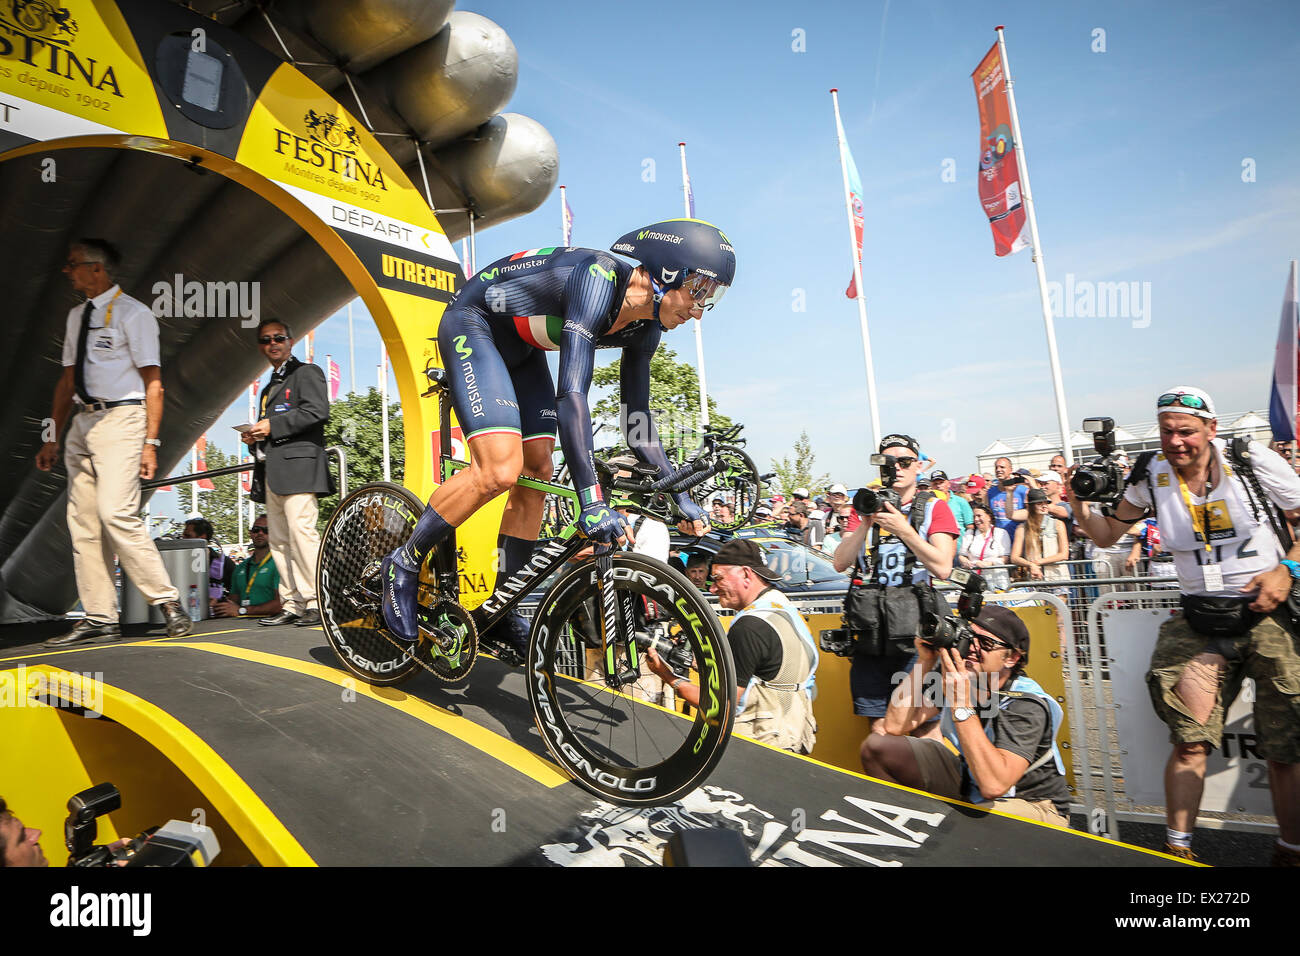 Movistar Cycling Team Stock Photos   Movistar Cycling Team Stock ... f45a228c2